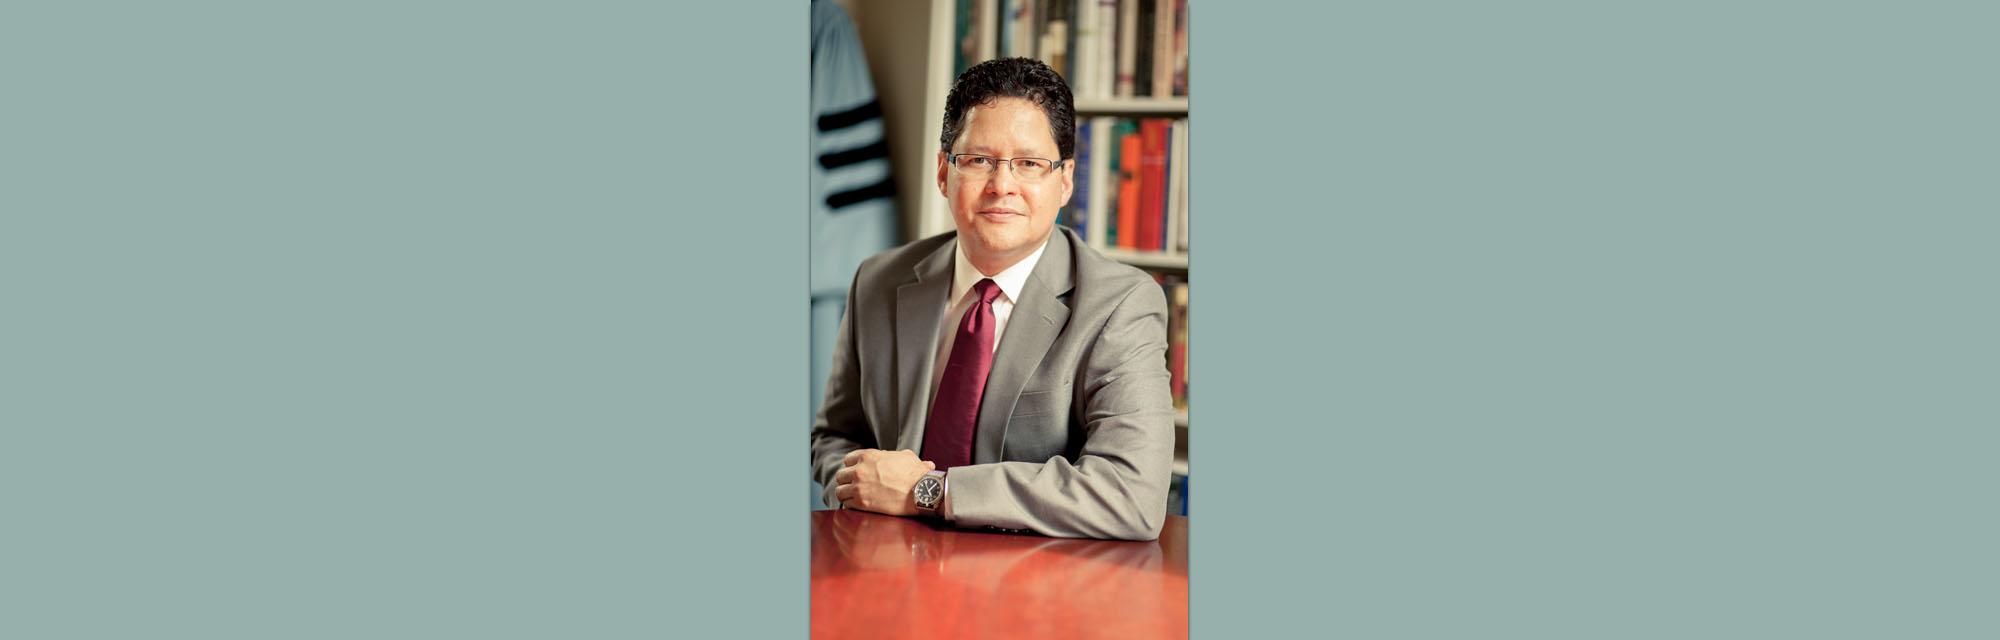 The Rev. Dr. Javier A. Viera